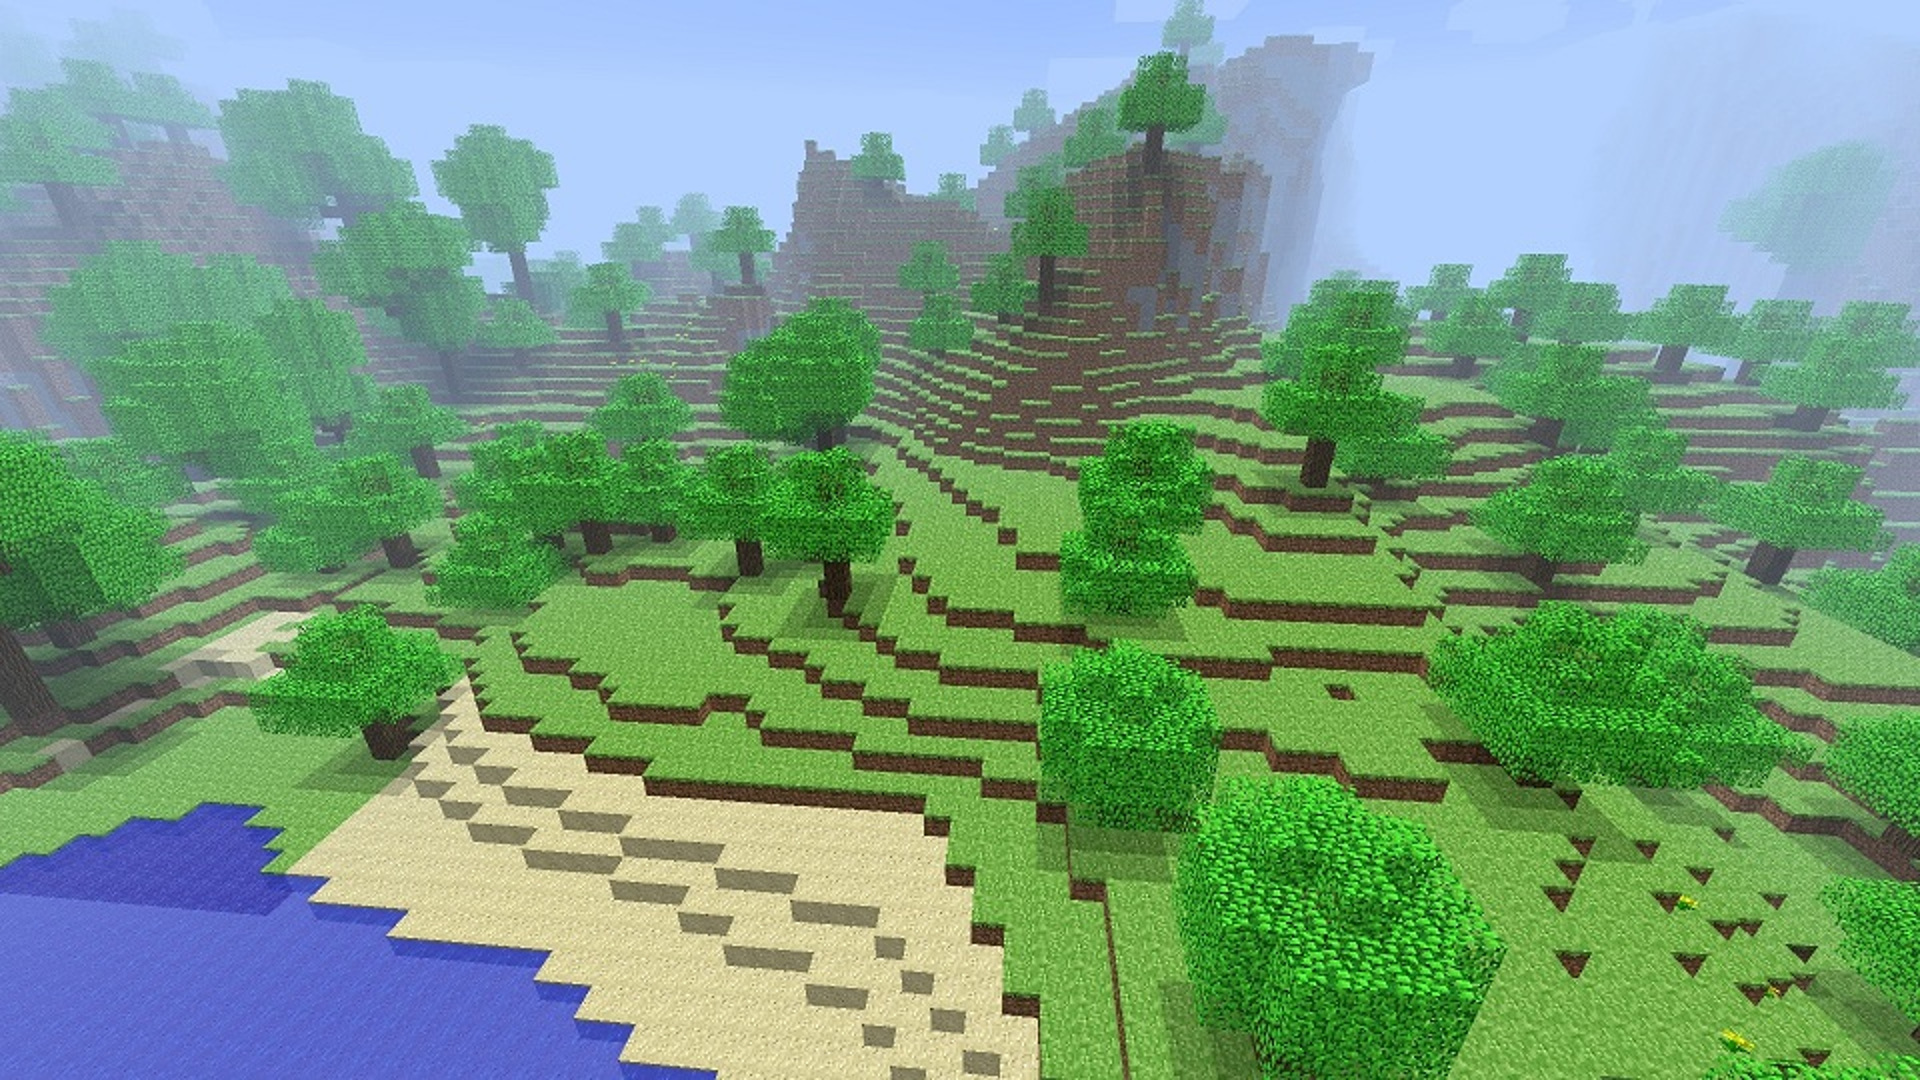 Minecraft_Herobrine.jpg